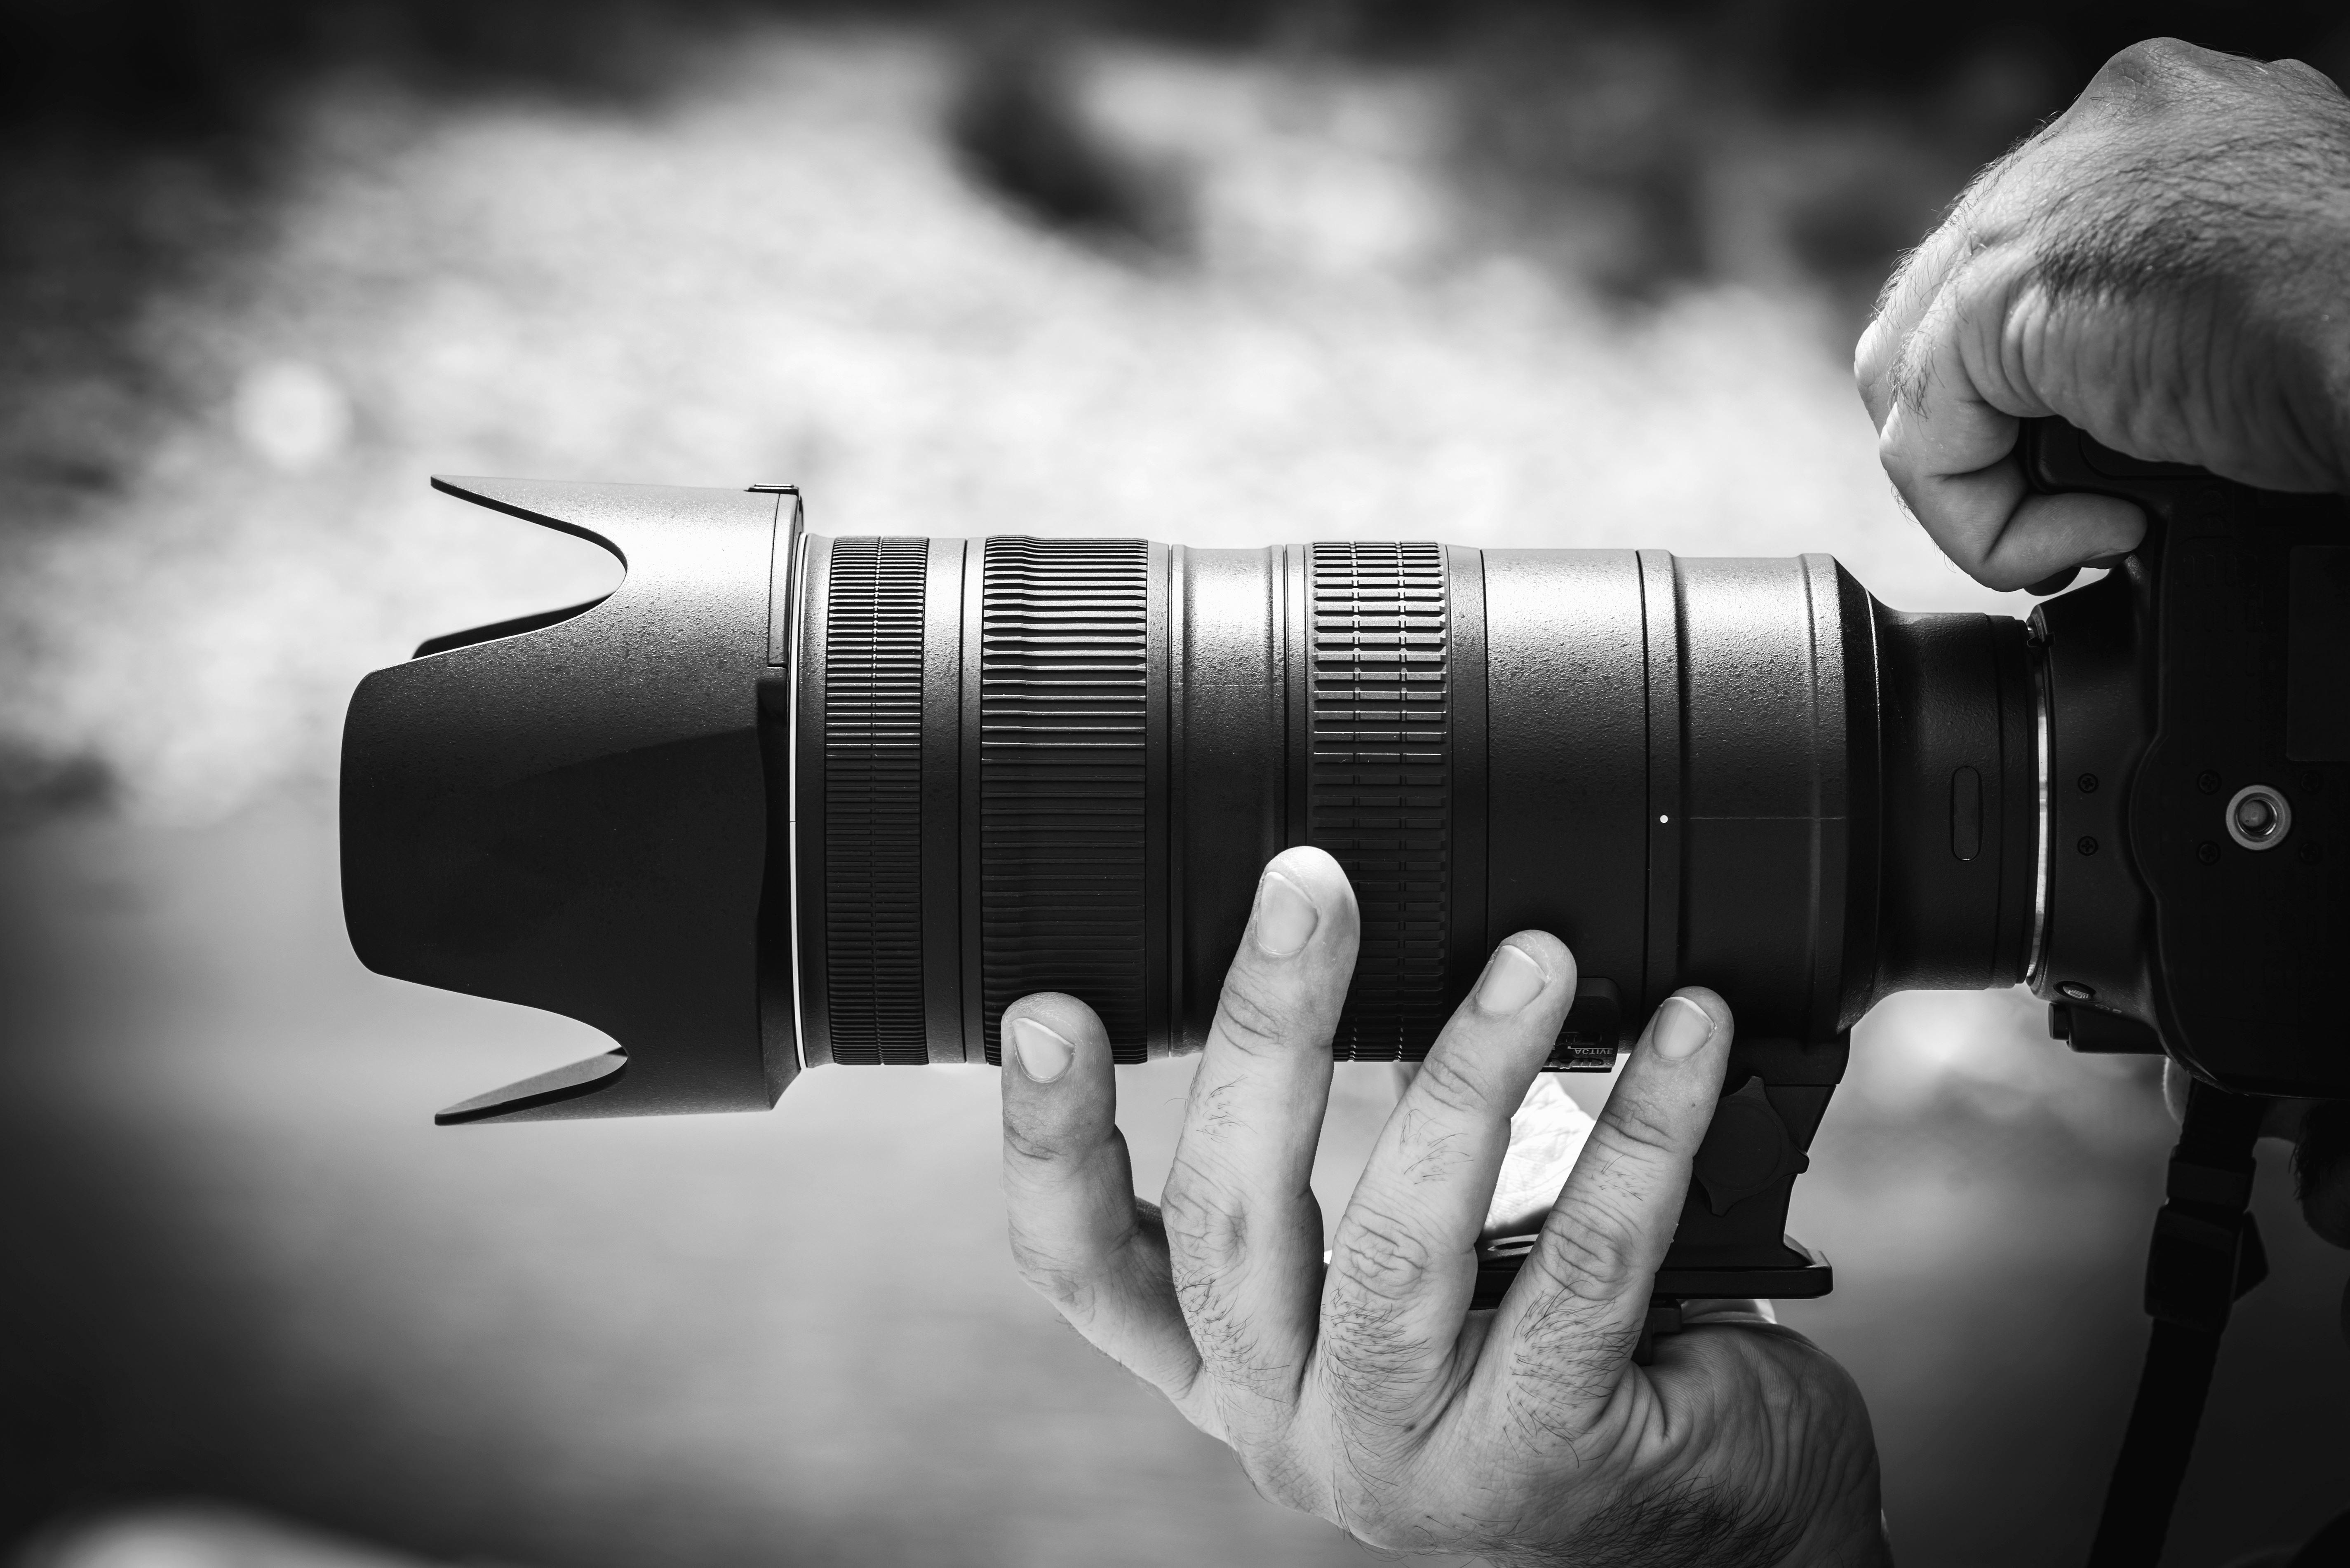 Картинки про фотографов, днем